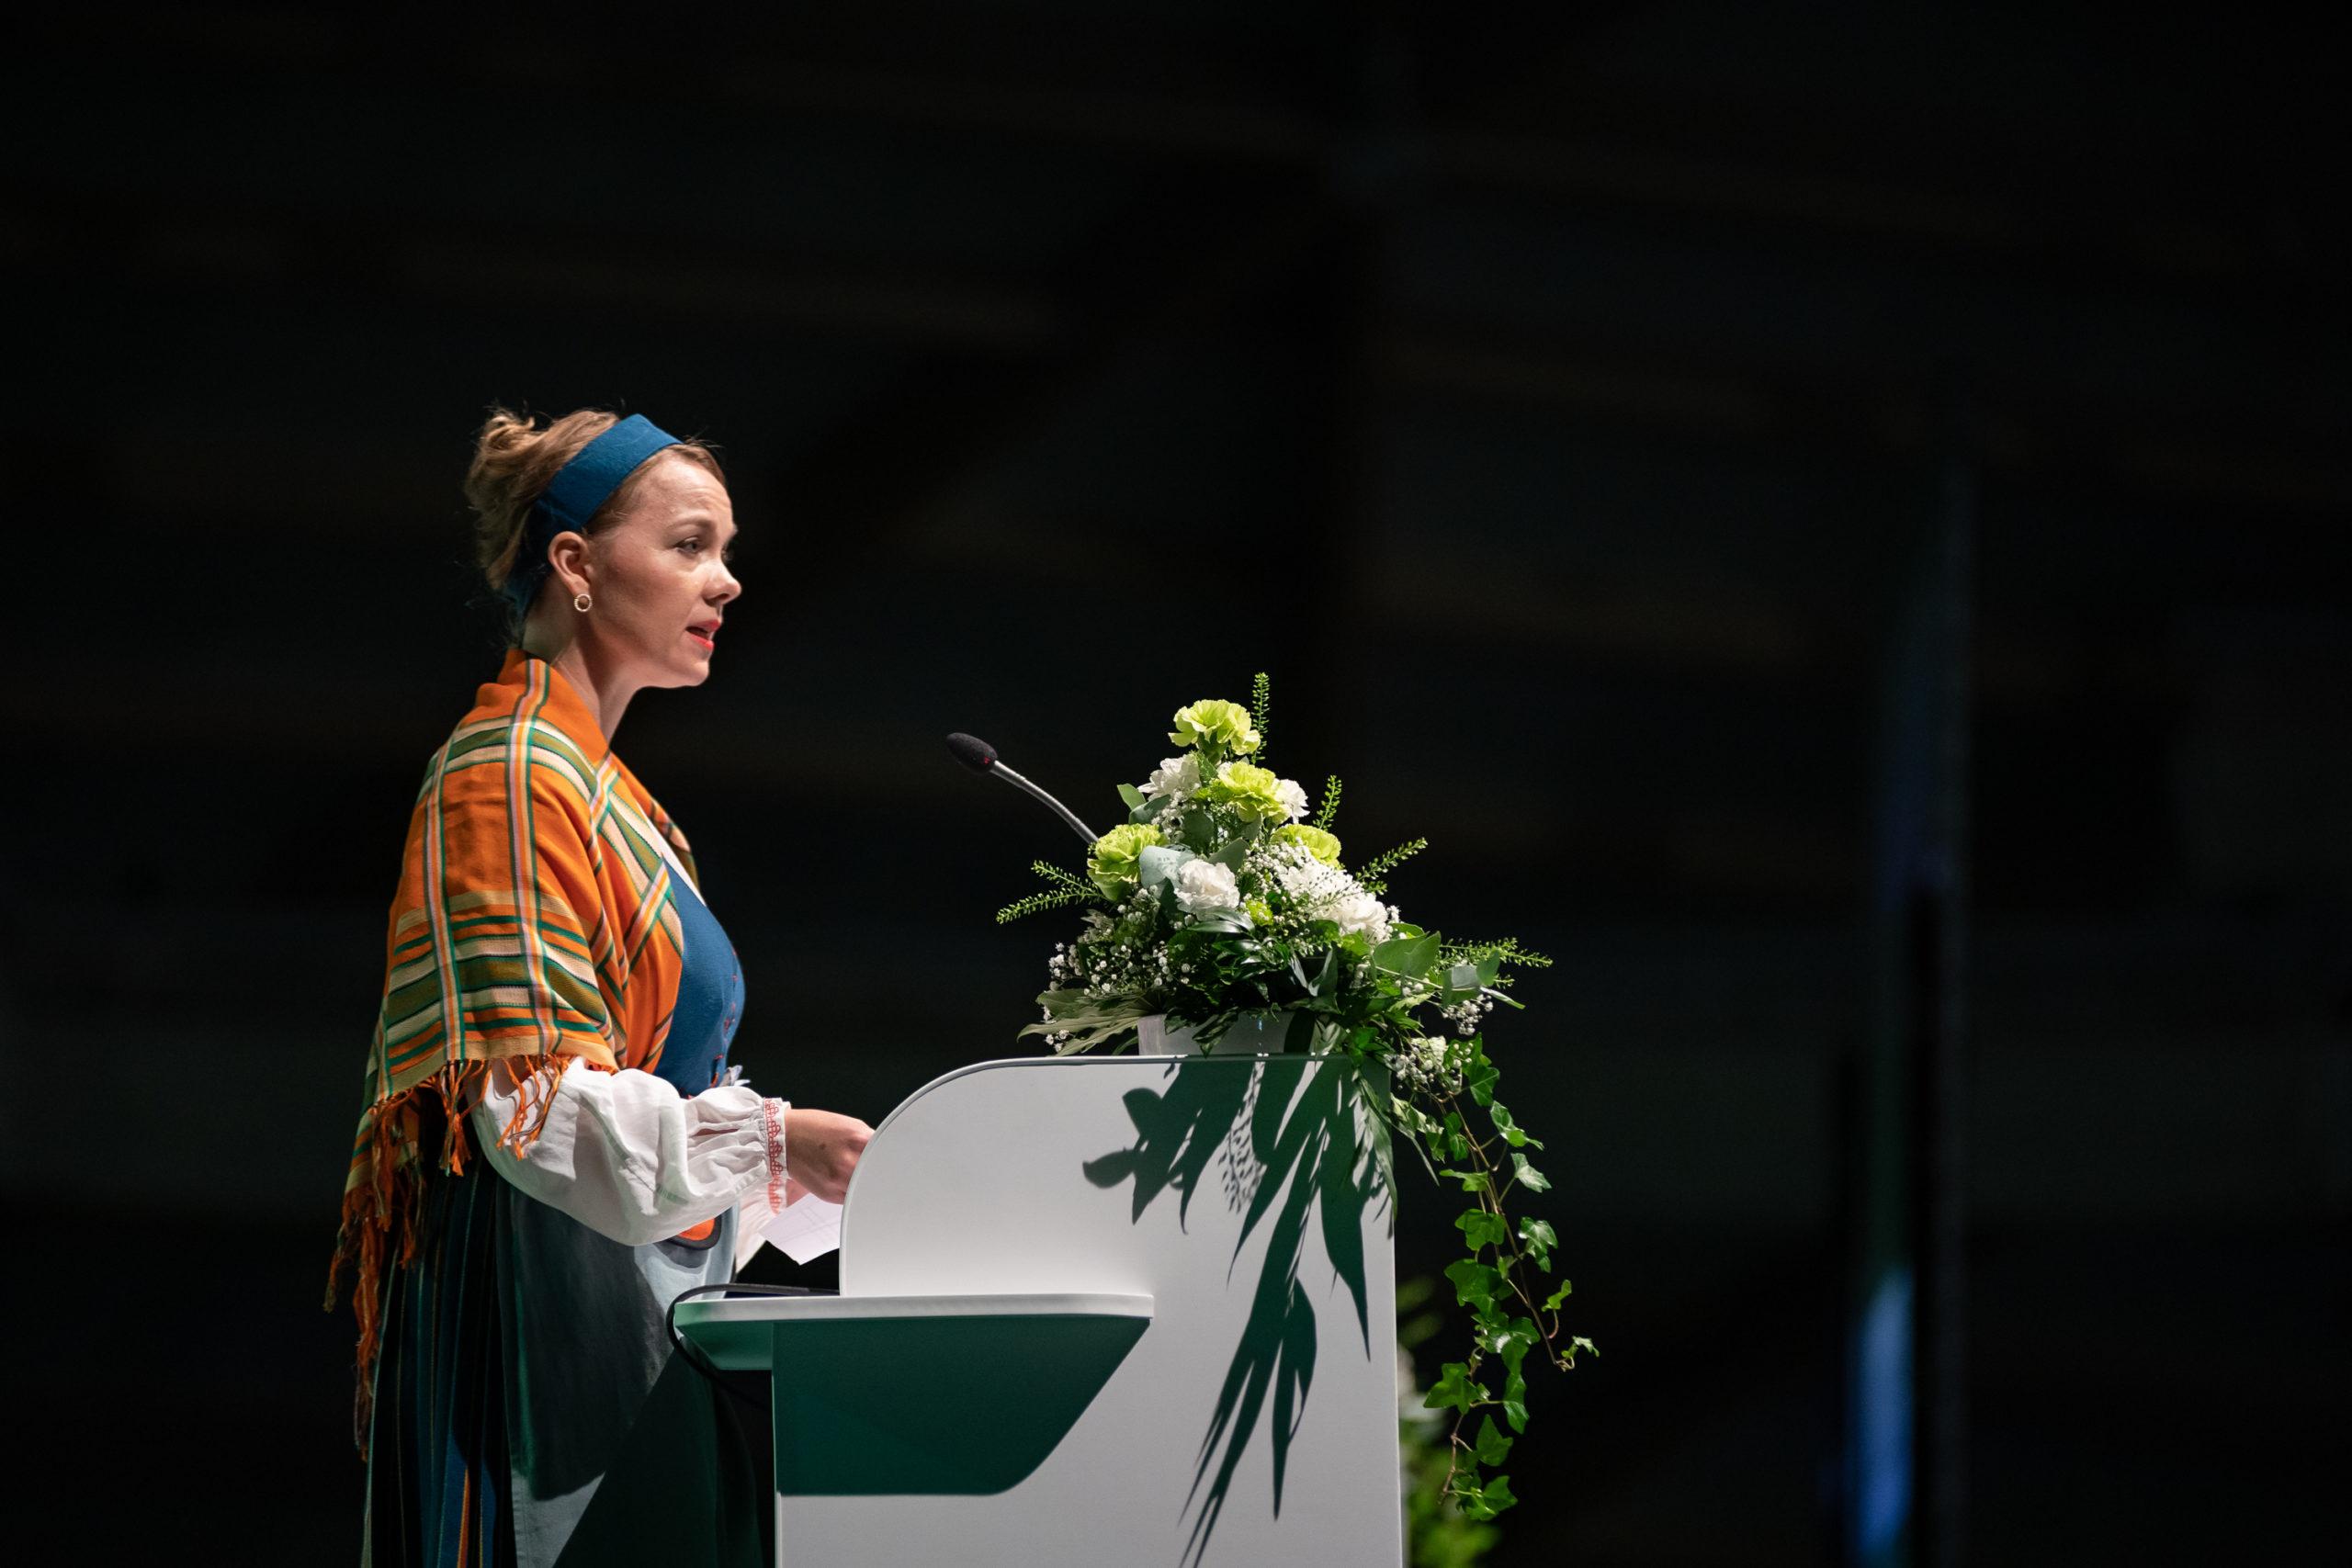 Puheenjohtaja Katri Kulmuni